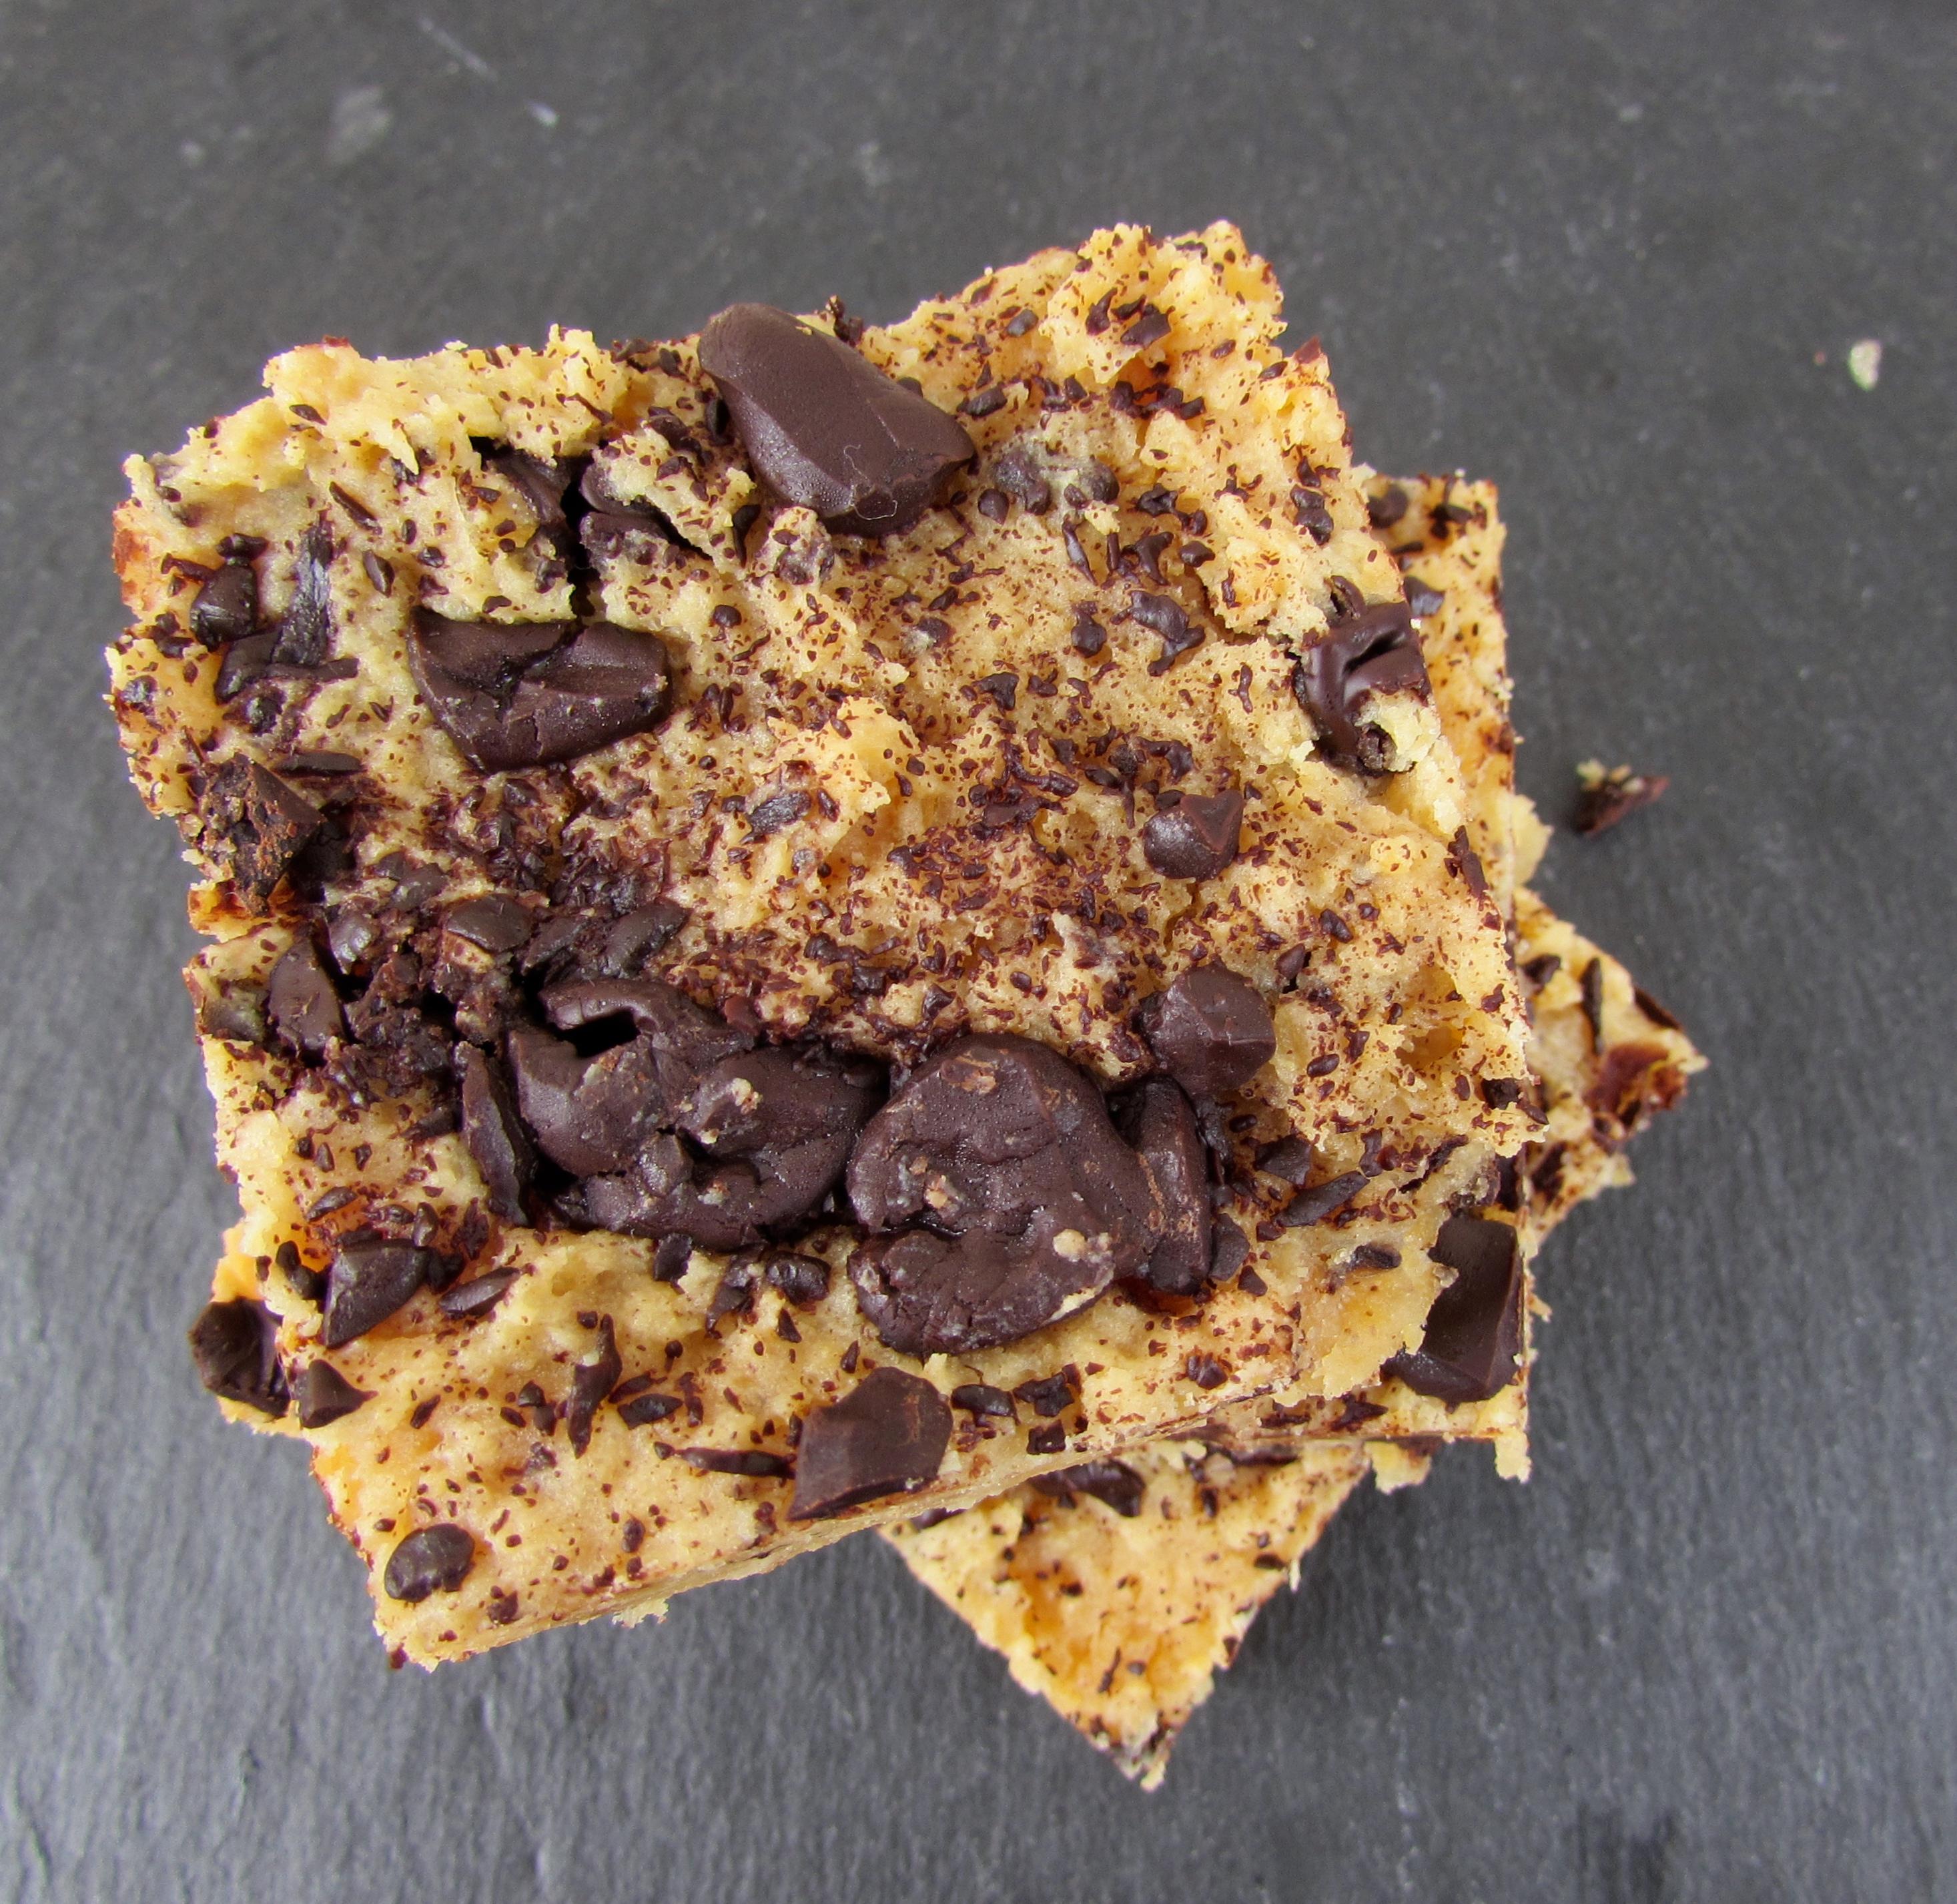 Www Sanella De Rezepte: Erdnussbutter Kuchen Ohne Backen